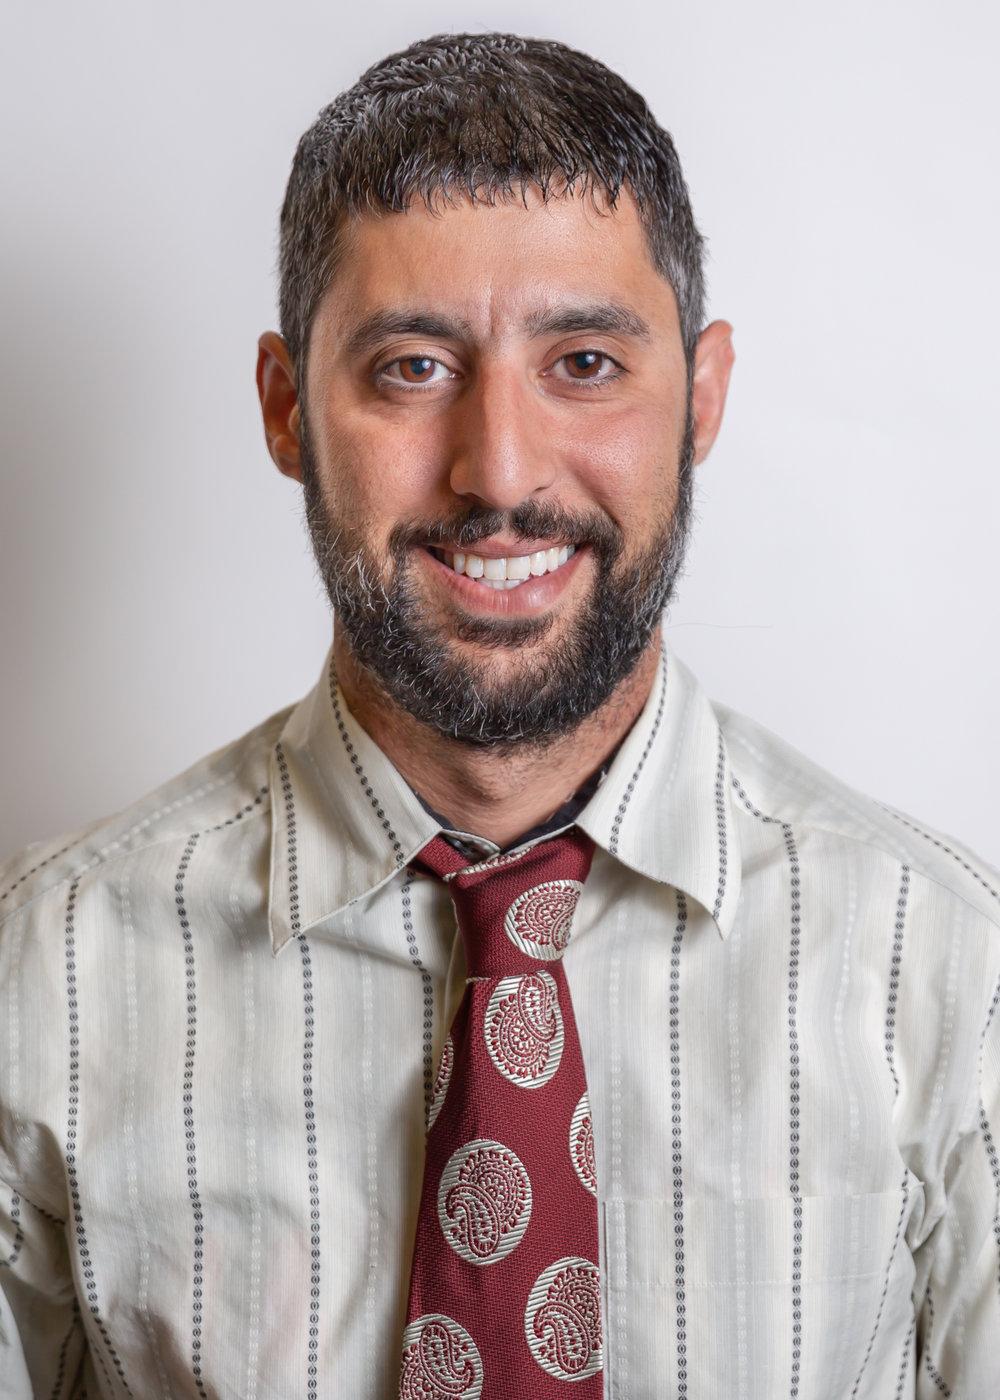 Aaron Nardi | Technical Director On staff since 2013